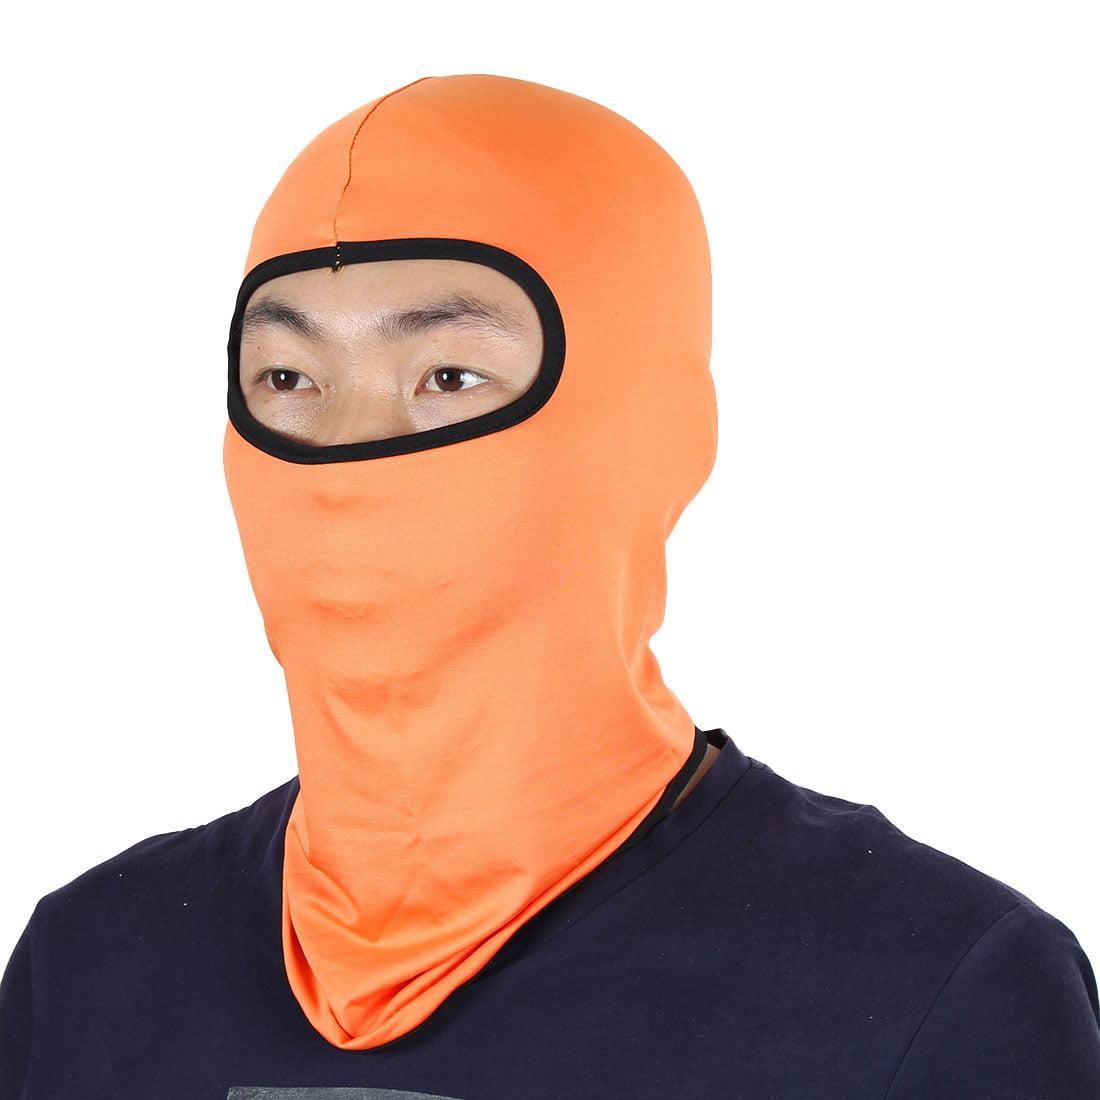 Face Mask Activities Cycling Biking Neck Protector Hat Helmet Balaclava Orange